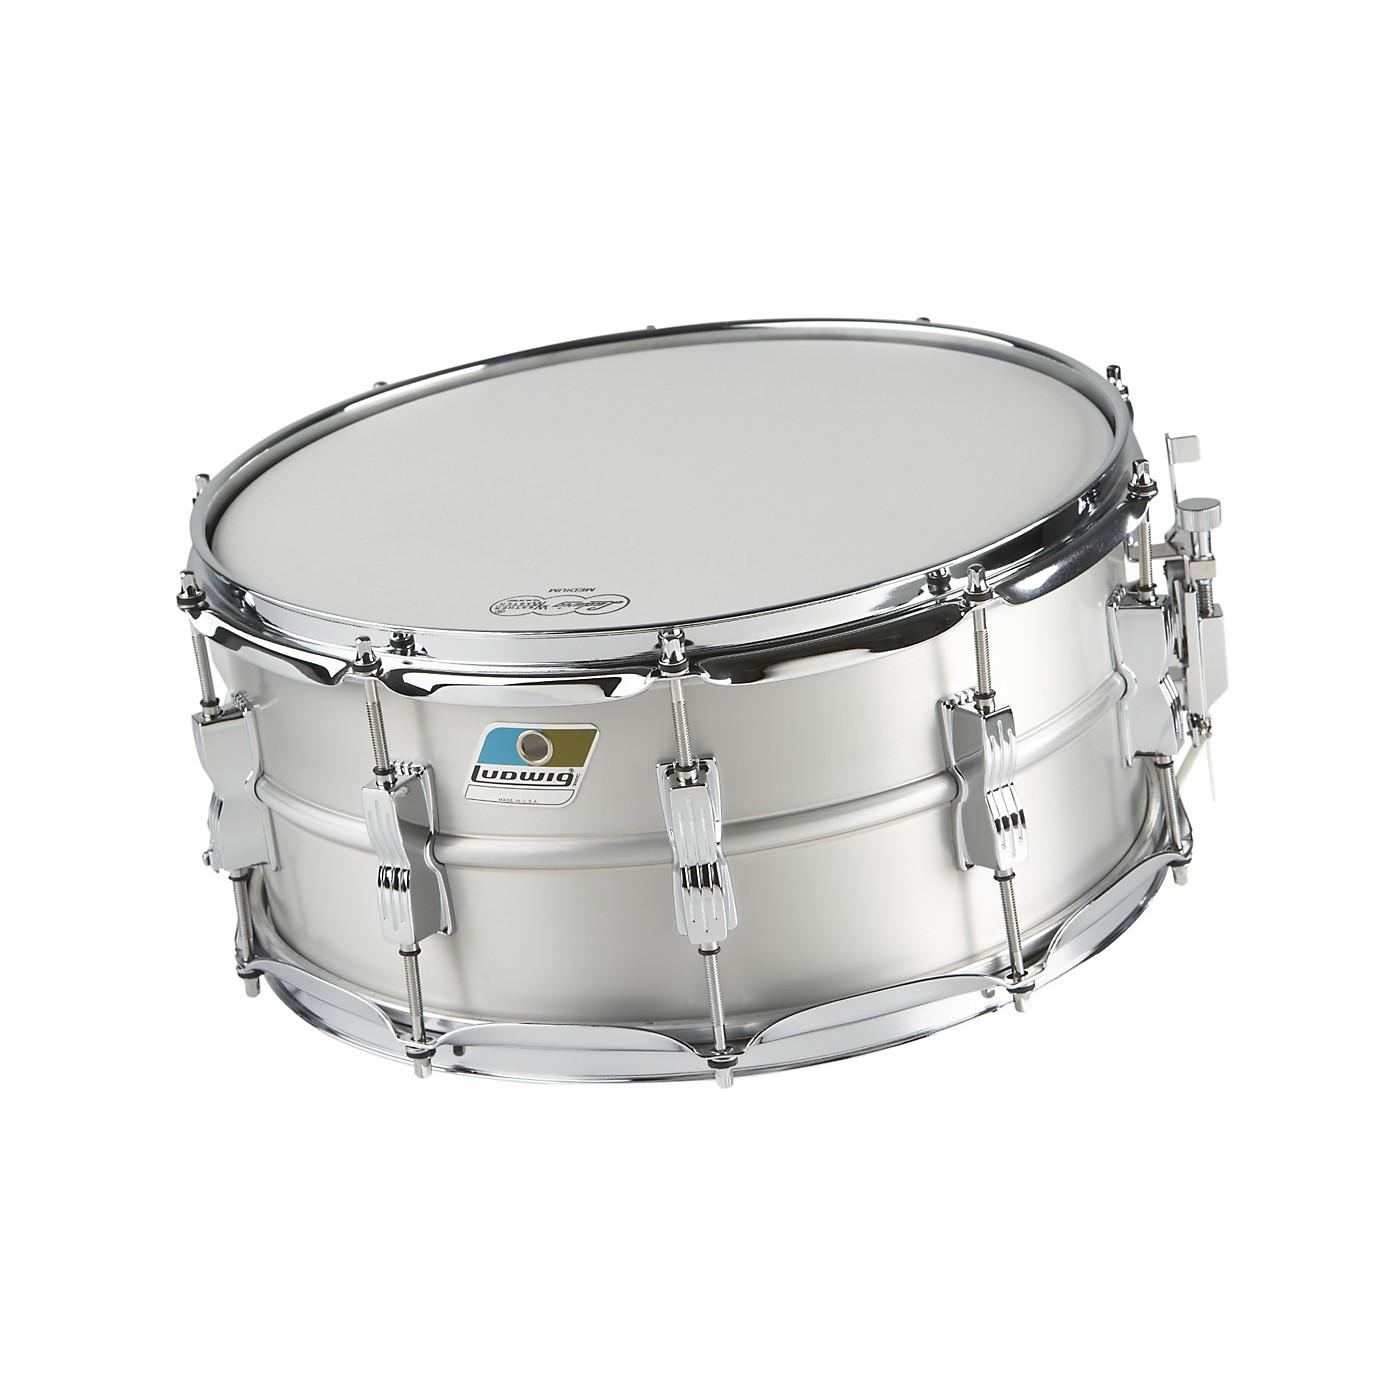 Ludwig Acrolite Classic Aluminum Snare Drum thumbnail